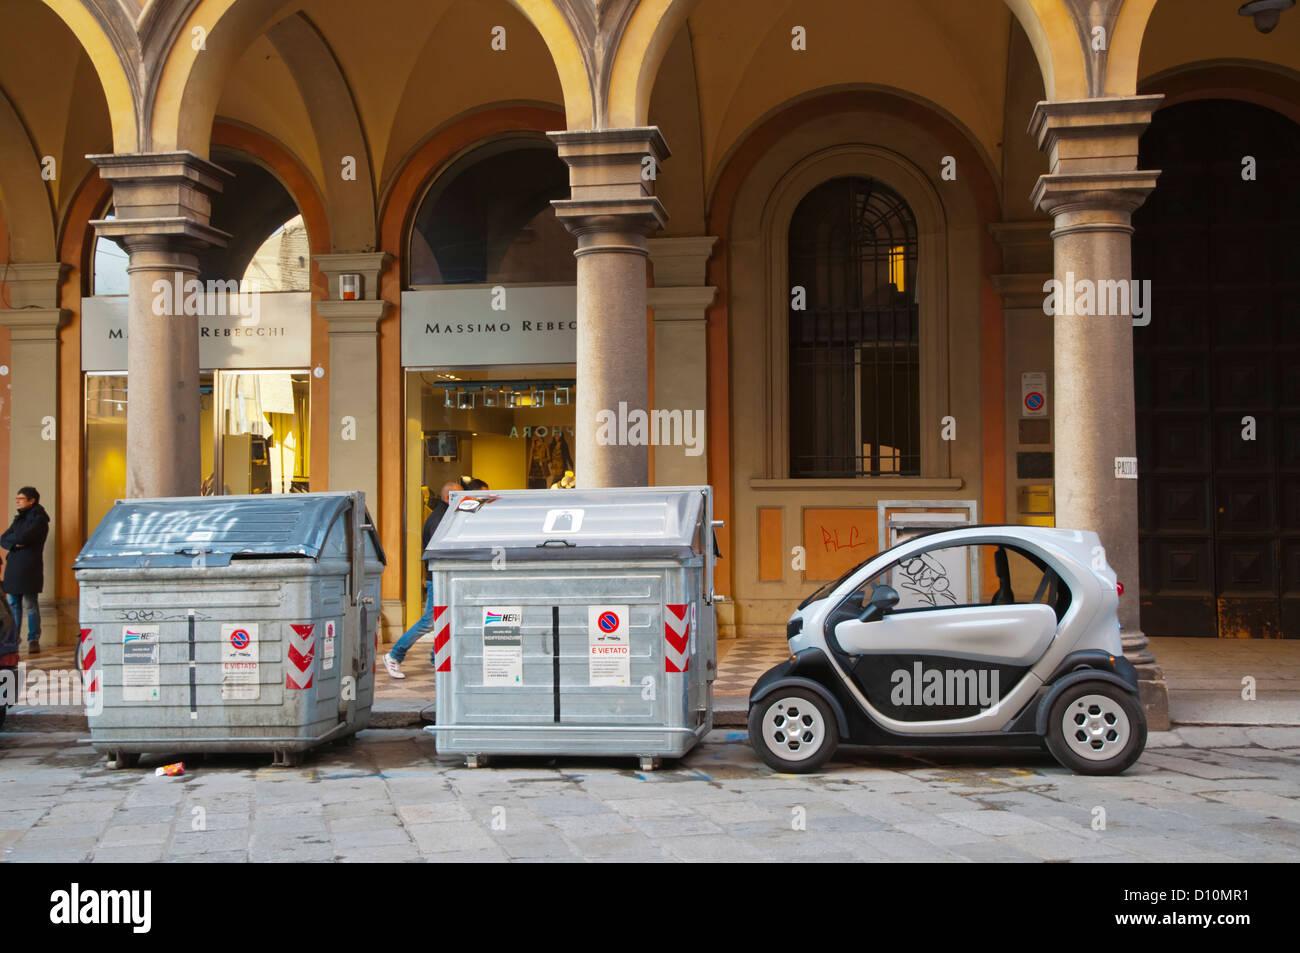 Renault Twizy electric car Bologna city Emilia-Romagna region northern Italy Europe Stock Photo